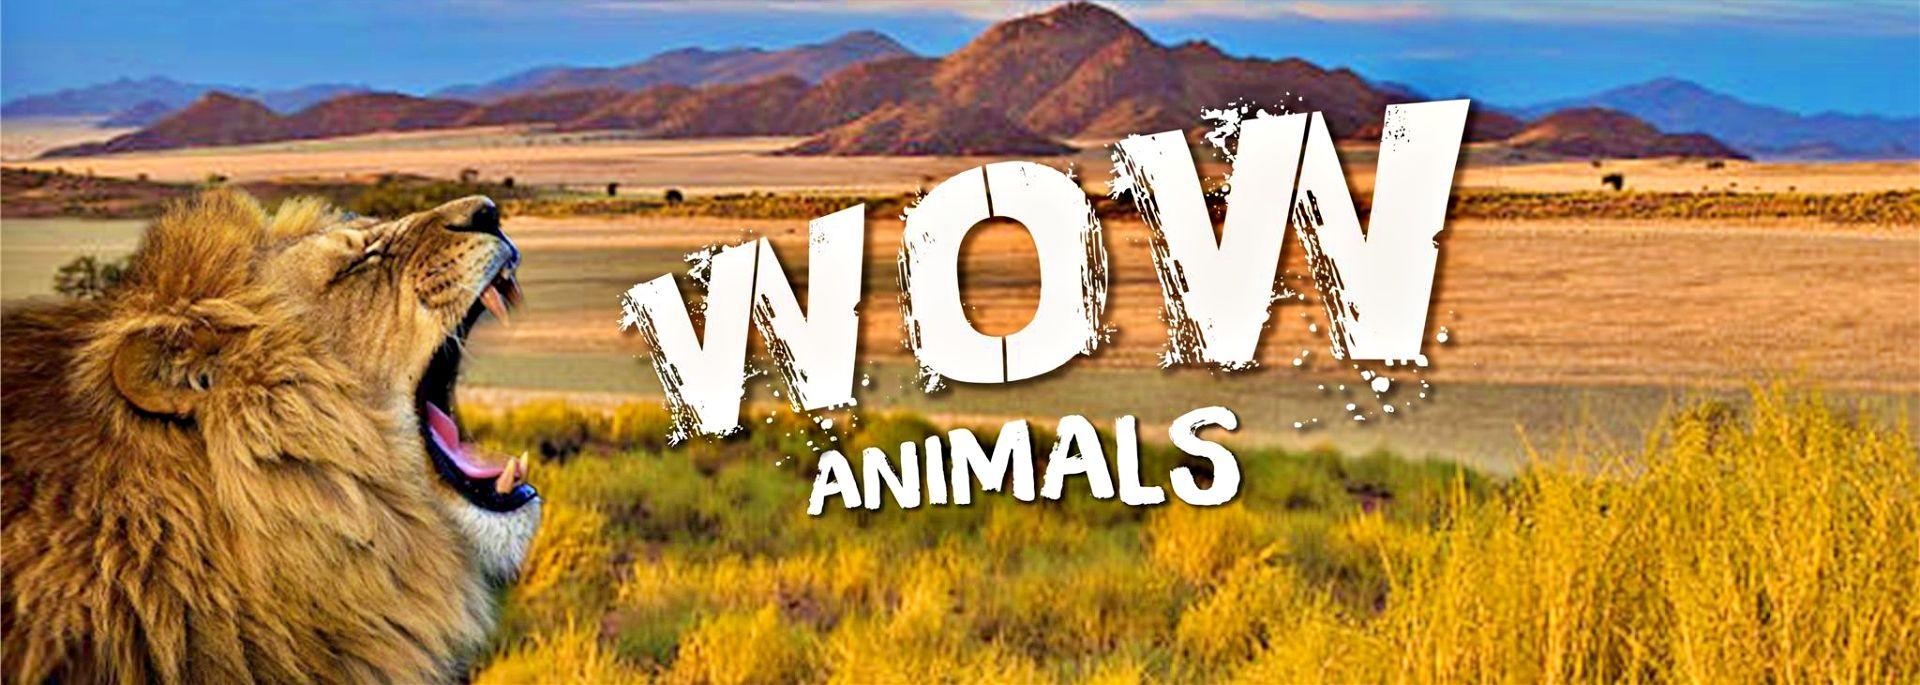 Wow Animals channel